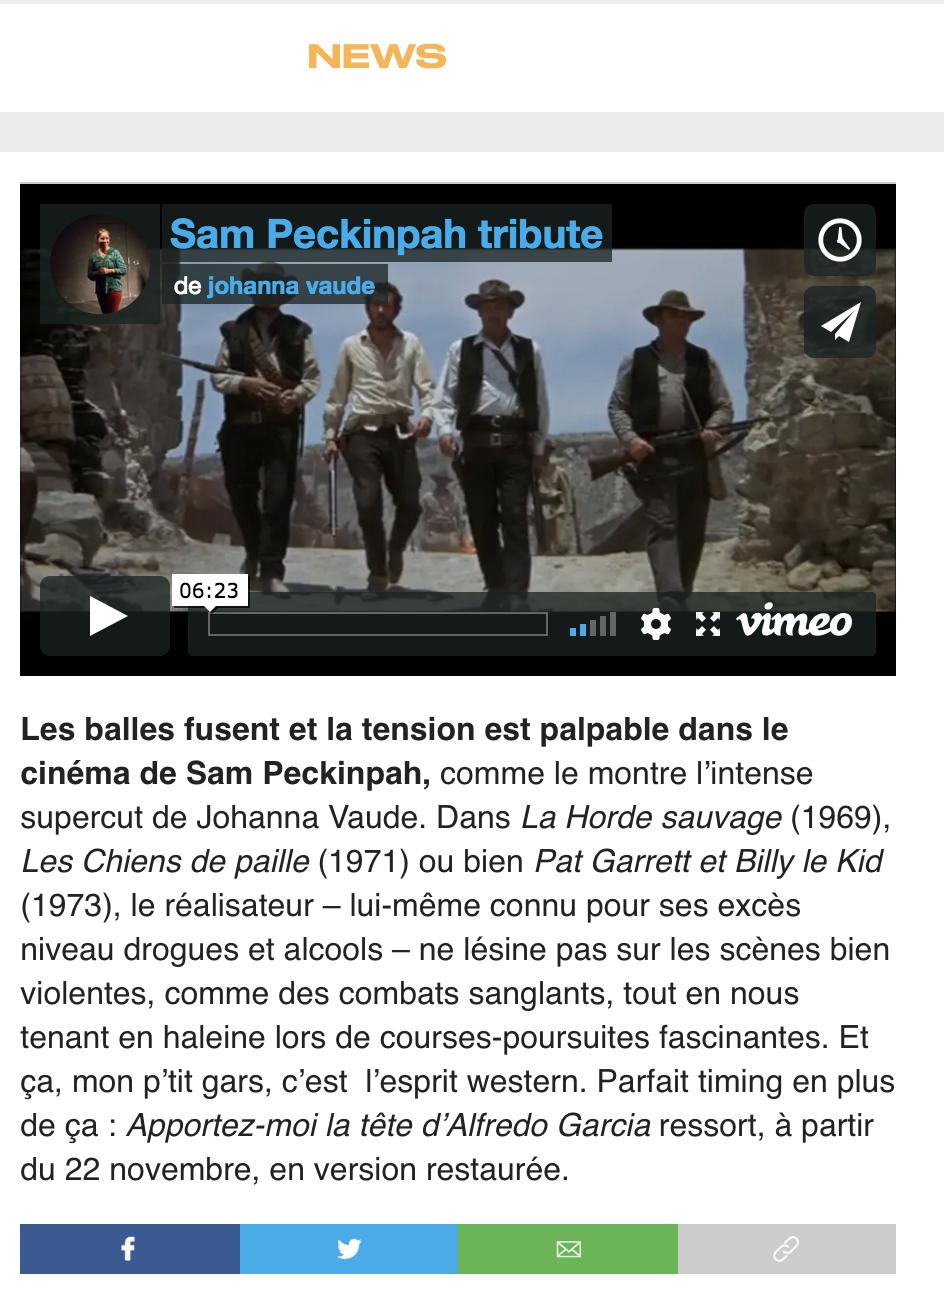 sam-peckinpah-johanna-vaude-supercut-trois-couleurs-mk2